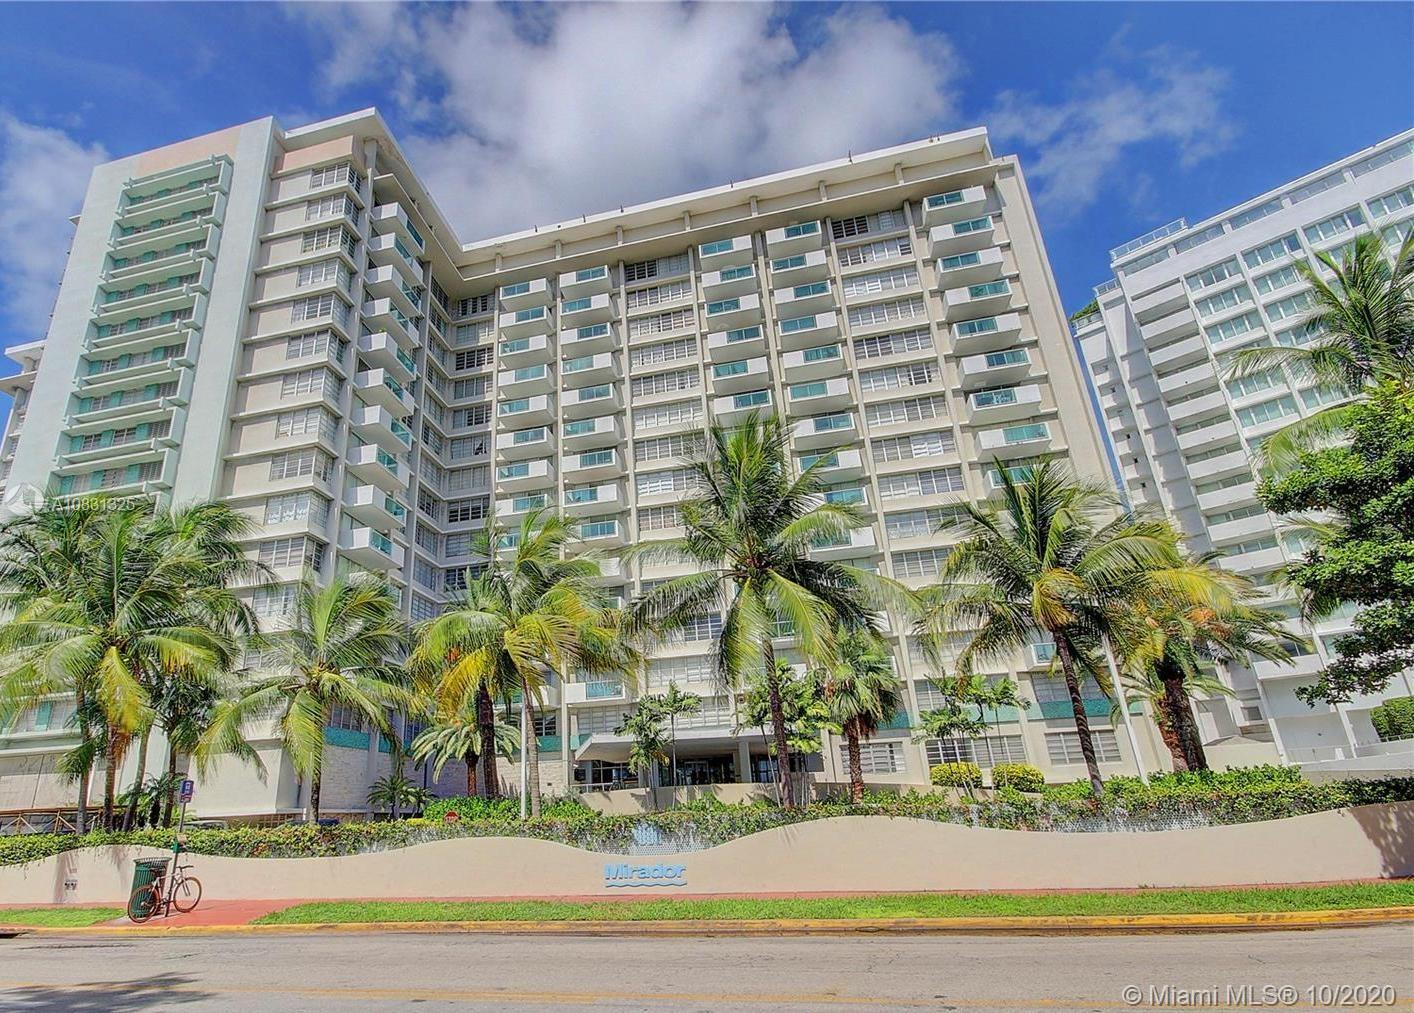 Mirador South #719 - 1000 West Ave #719, Miami Beach, FL 33139